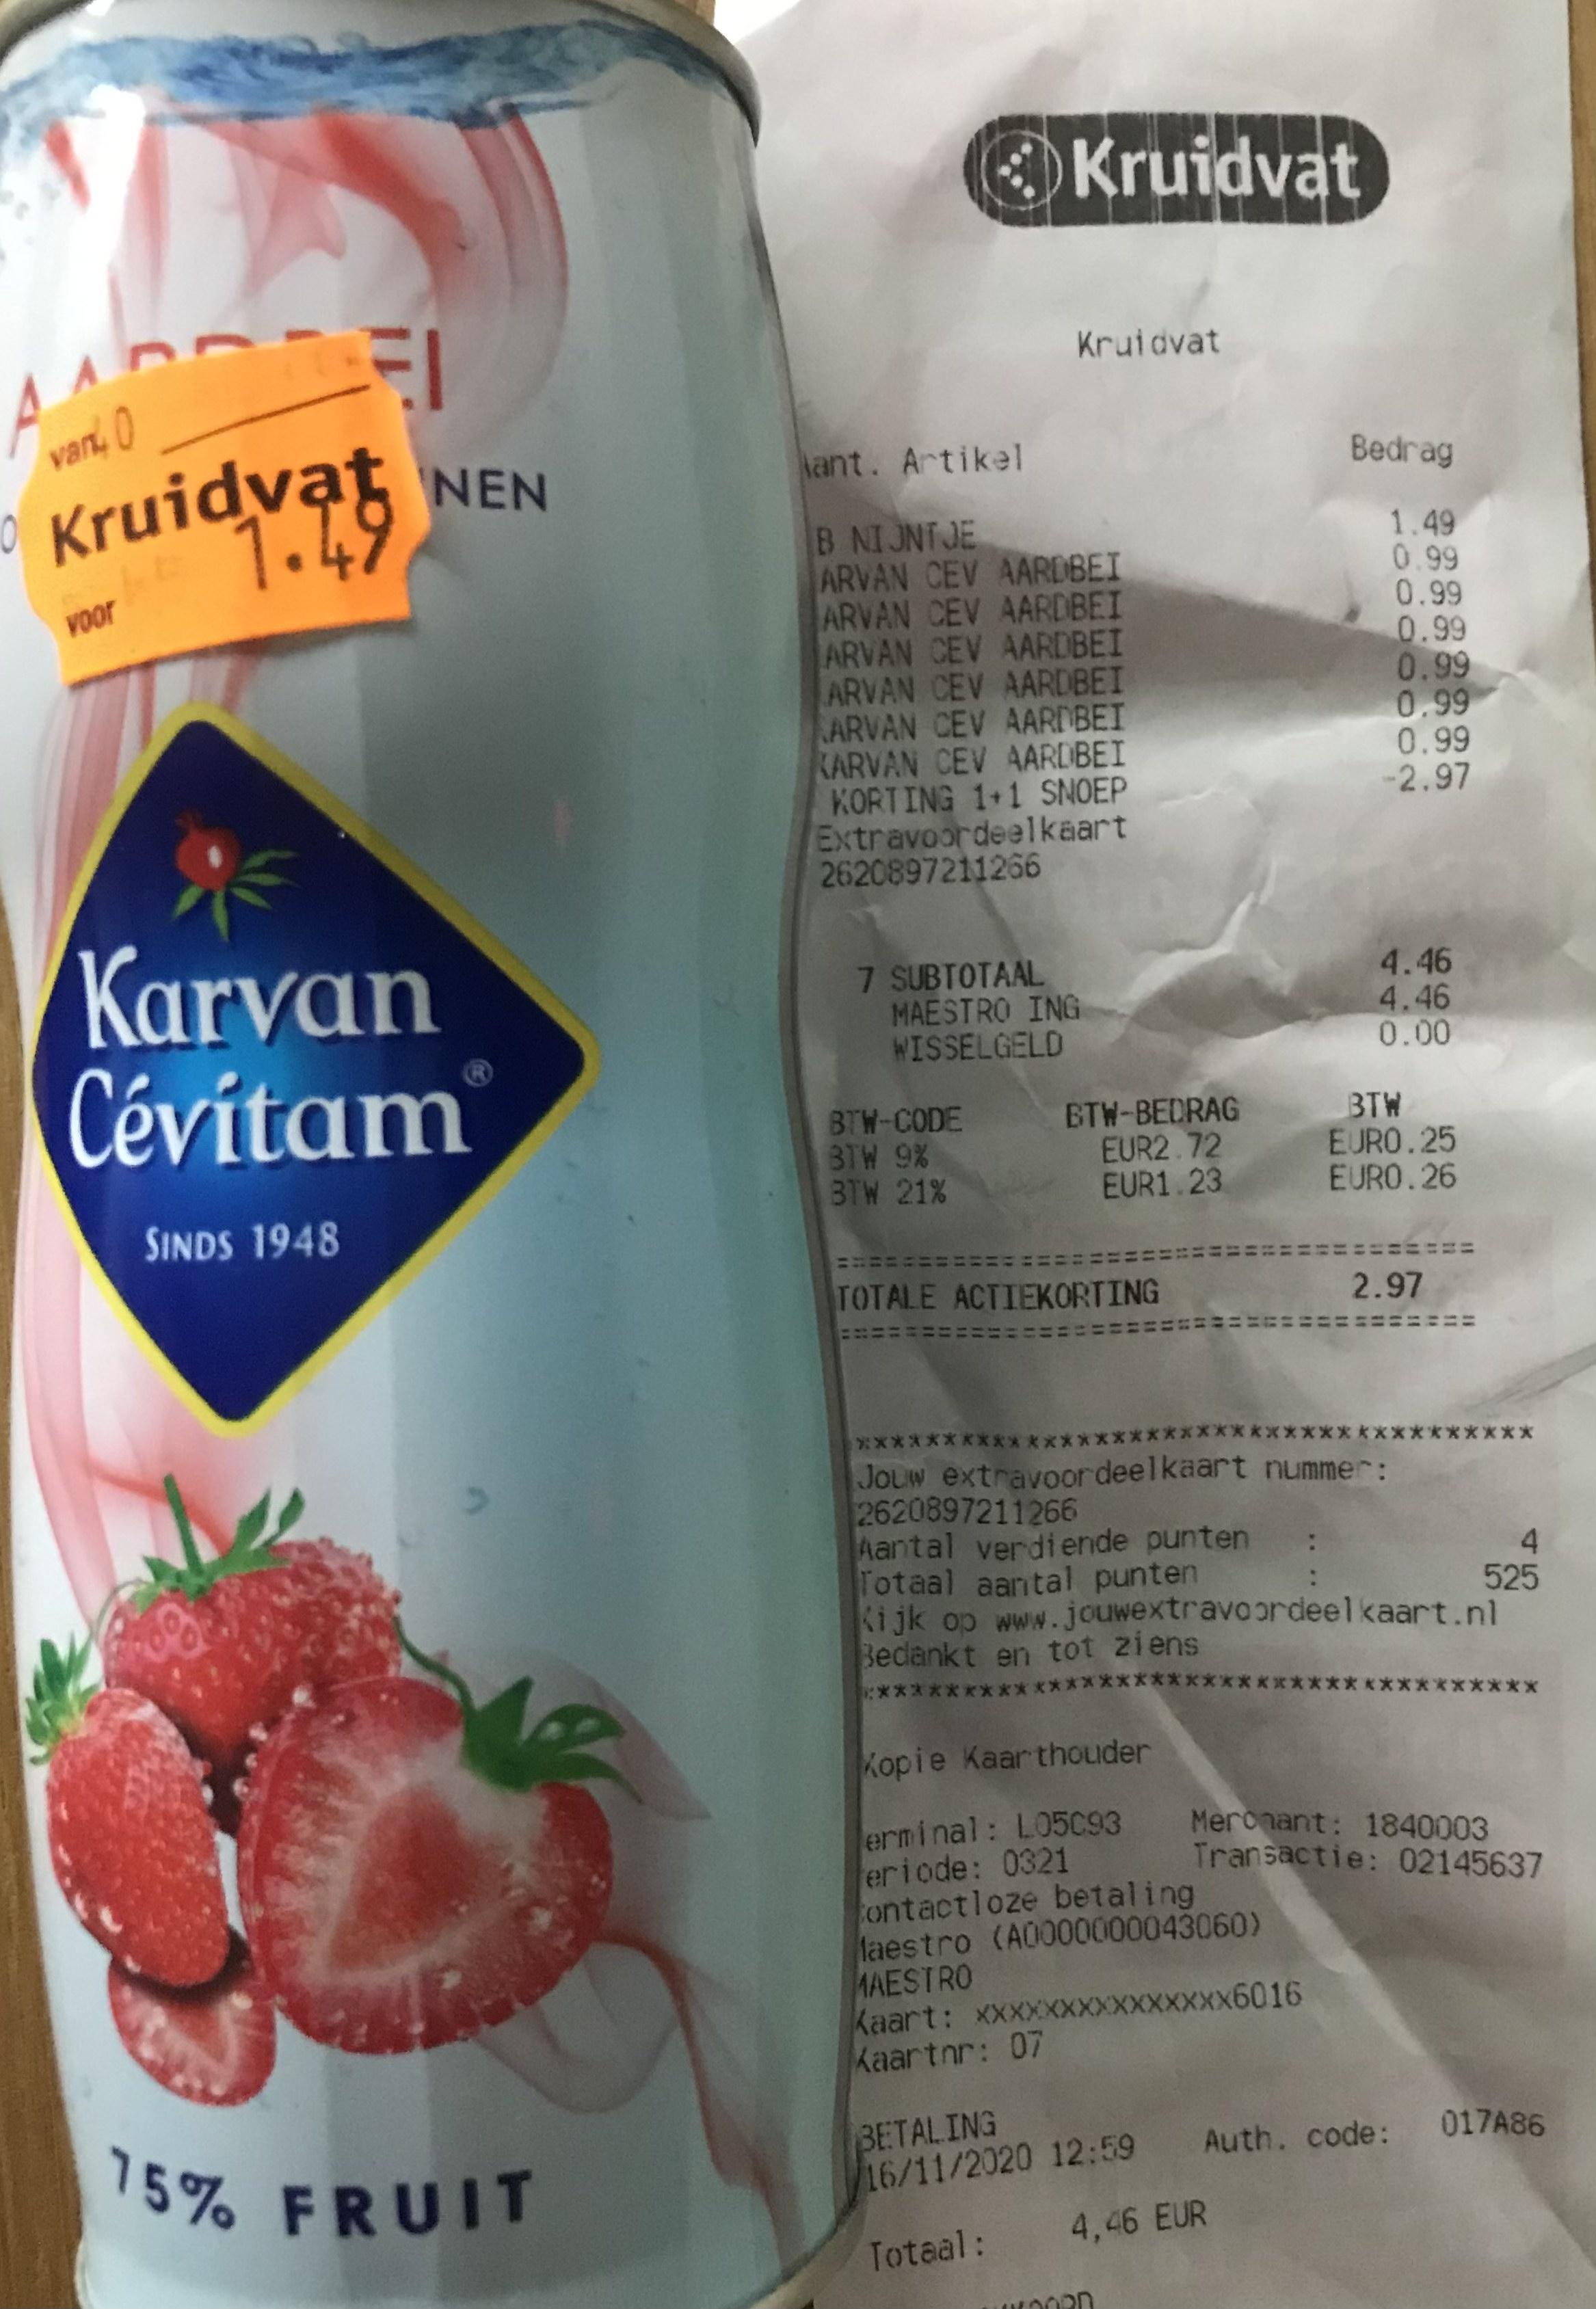 @Kruidvat: Karvan Cevitam 430ml 0,50 cent per stuk! Landelijk?